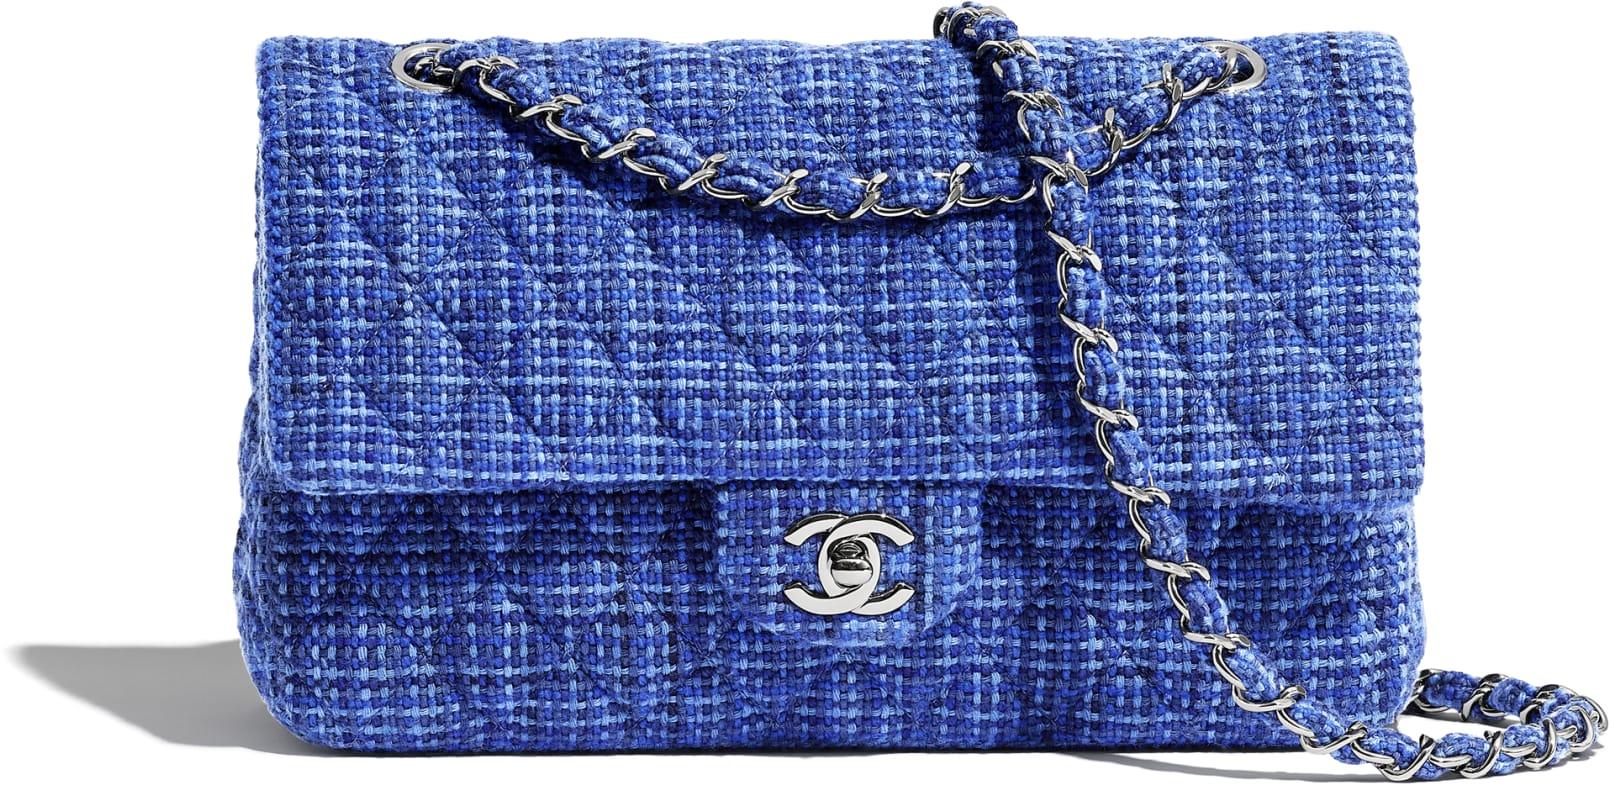 Classic Handbag